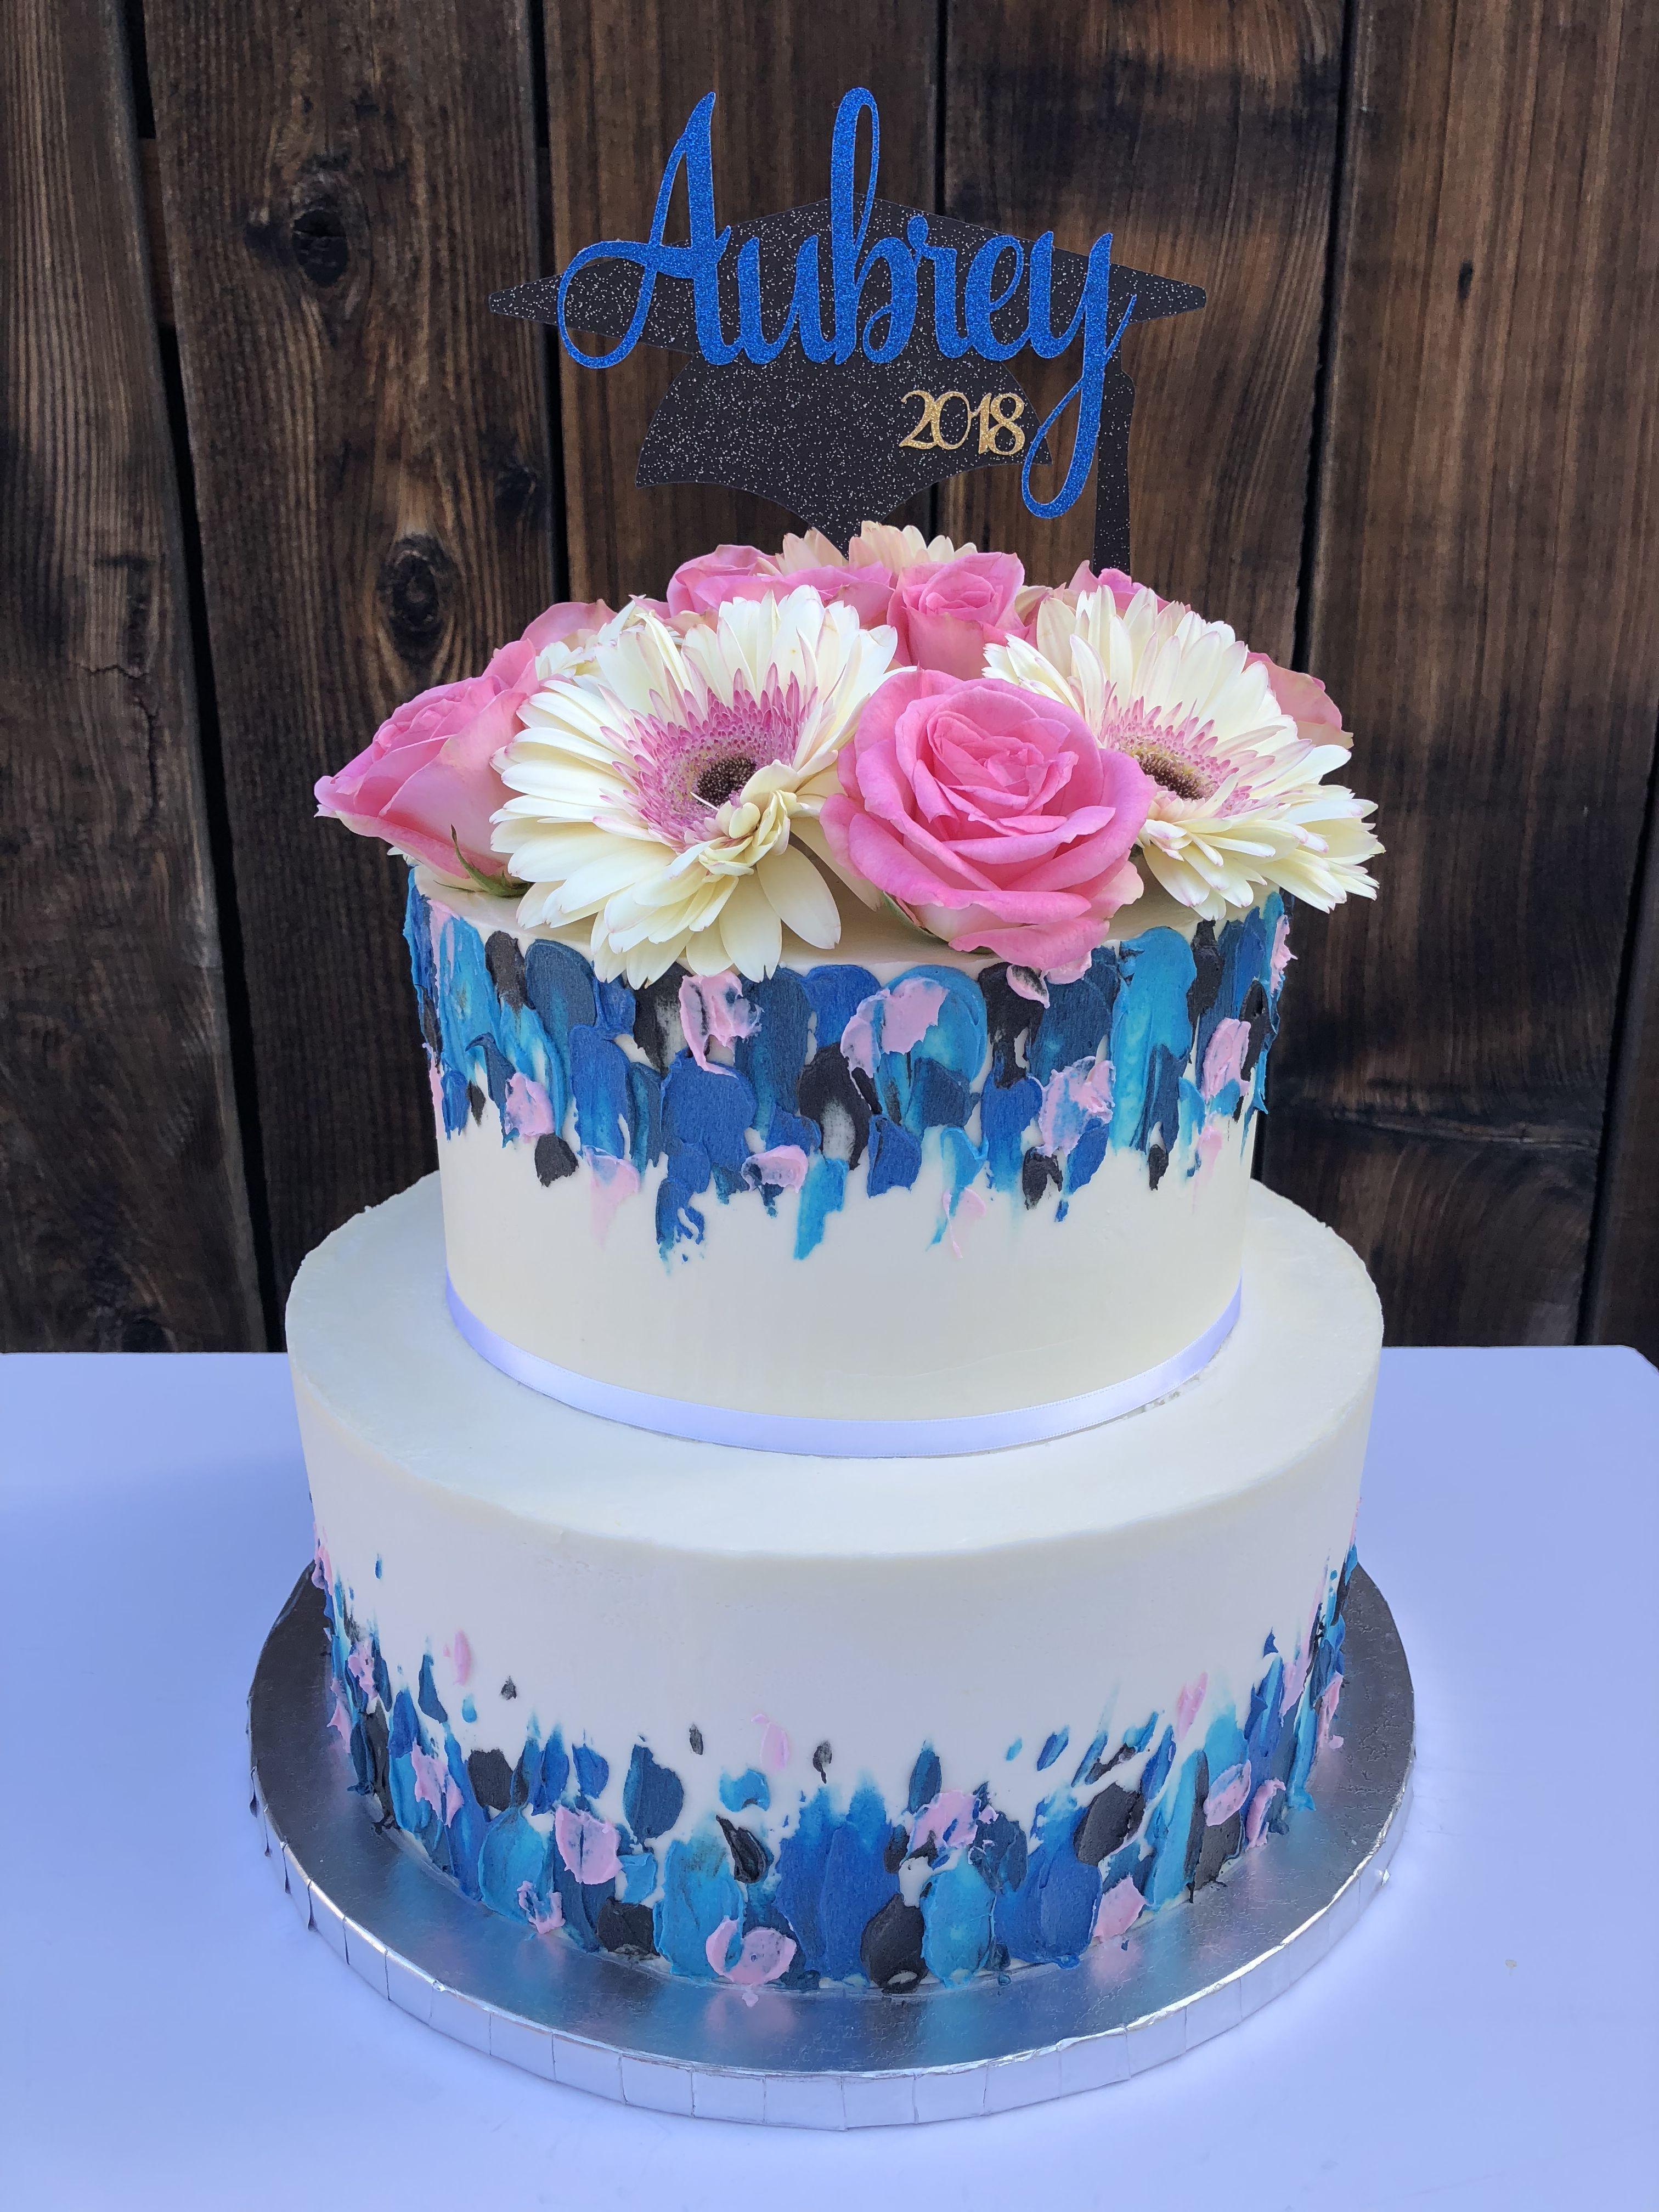 Buttercream graduation cake | Graduation cakes, Cake, Cake ...